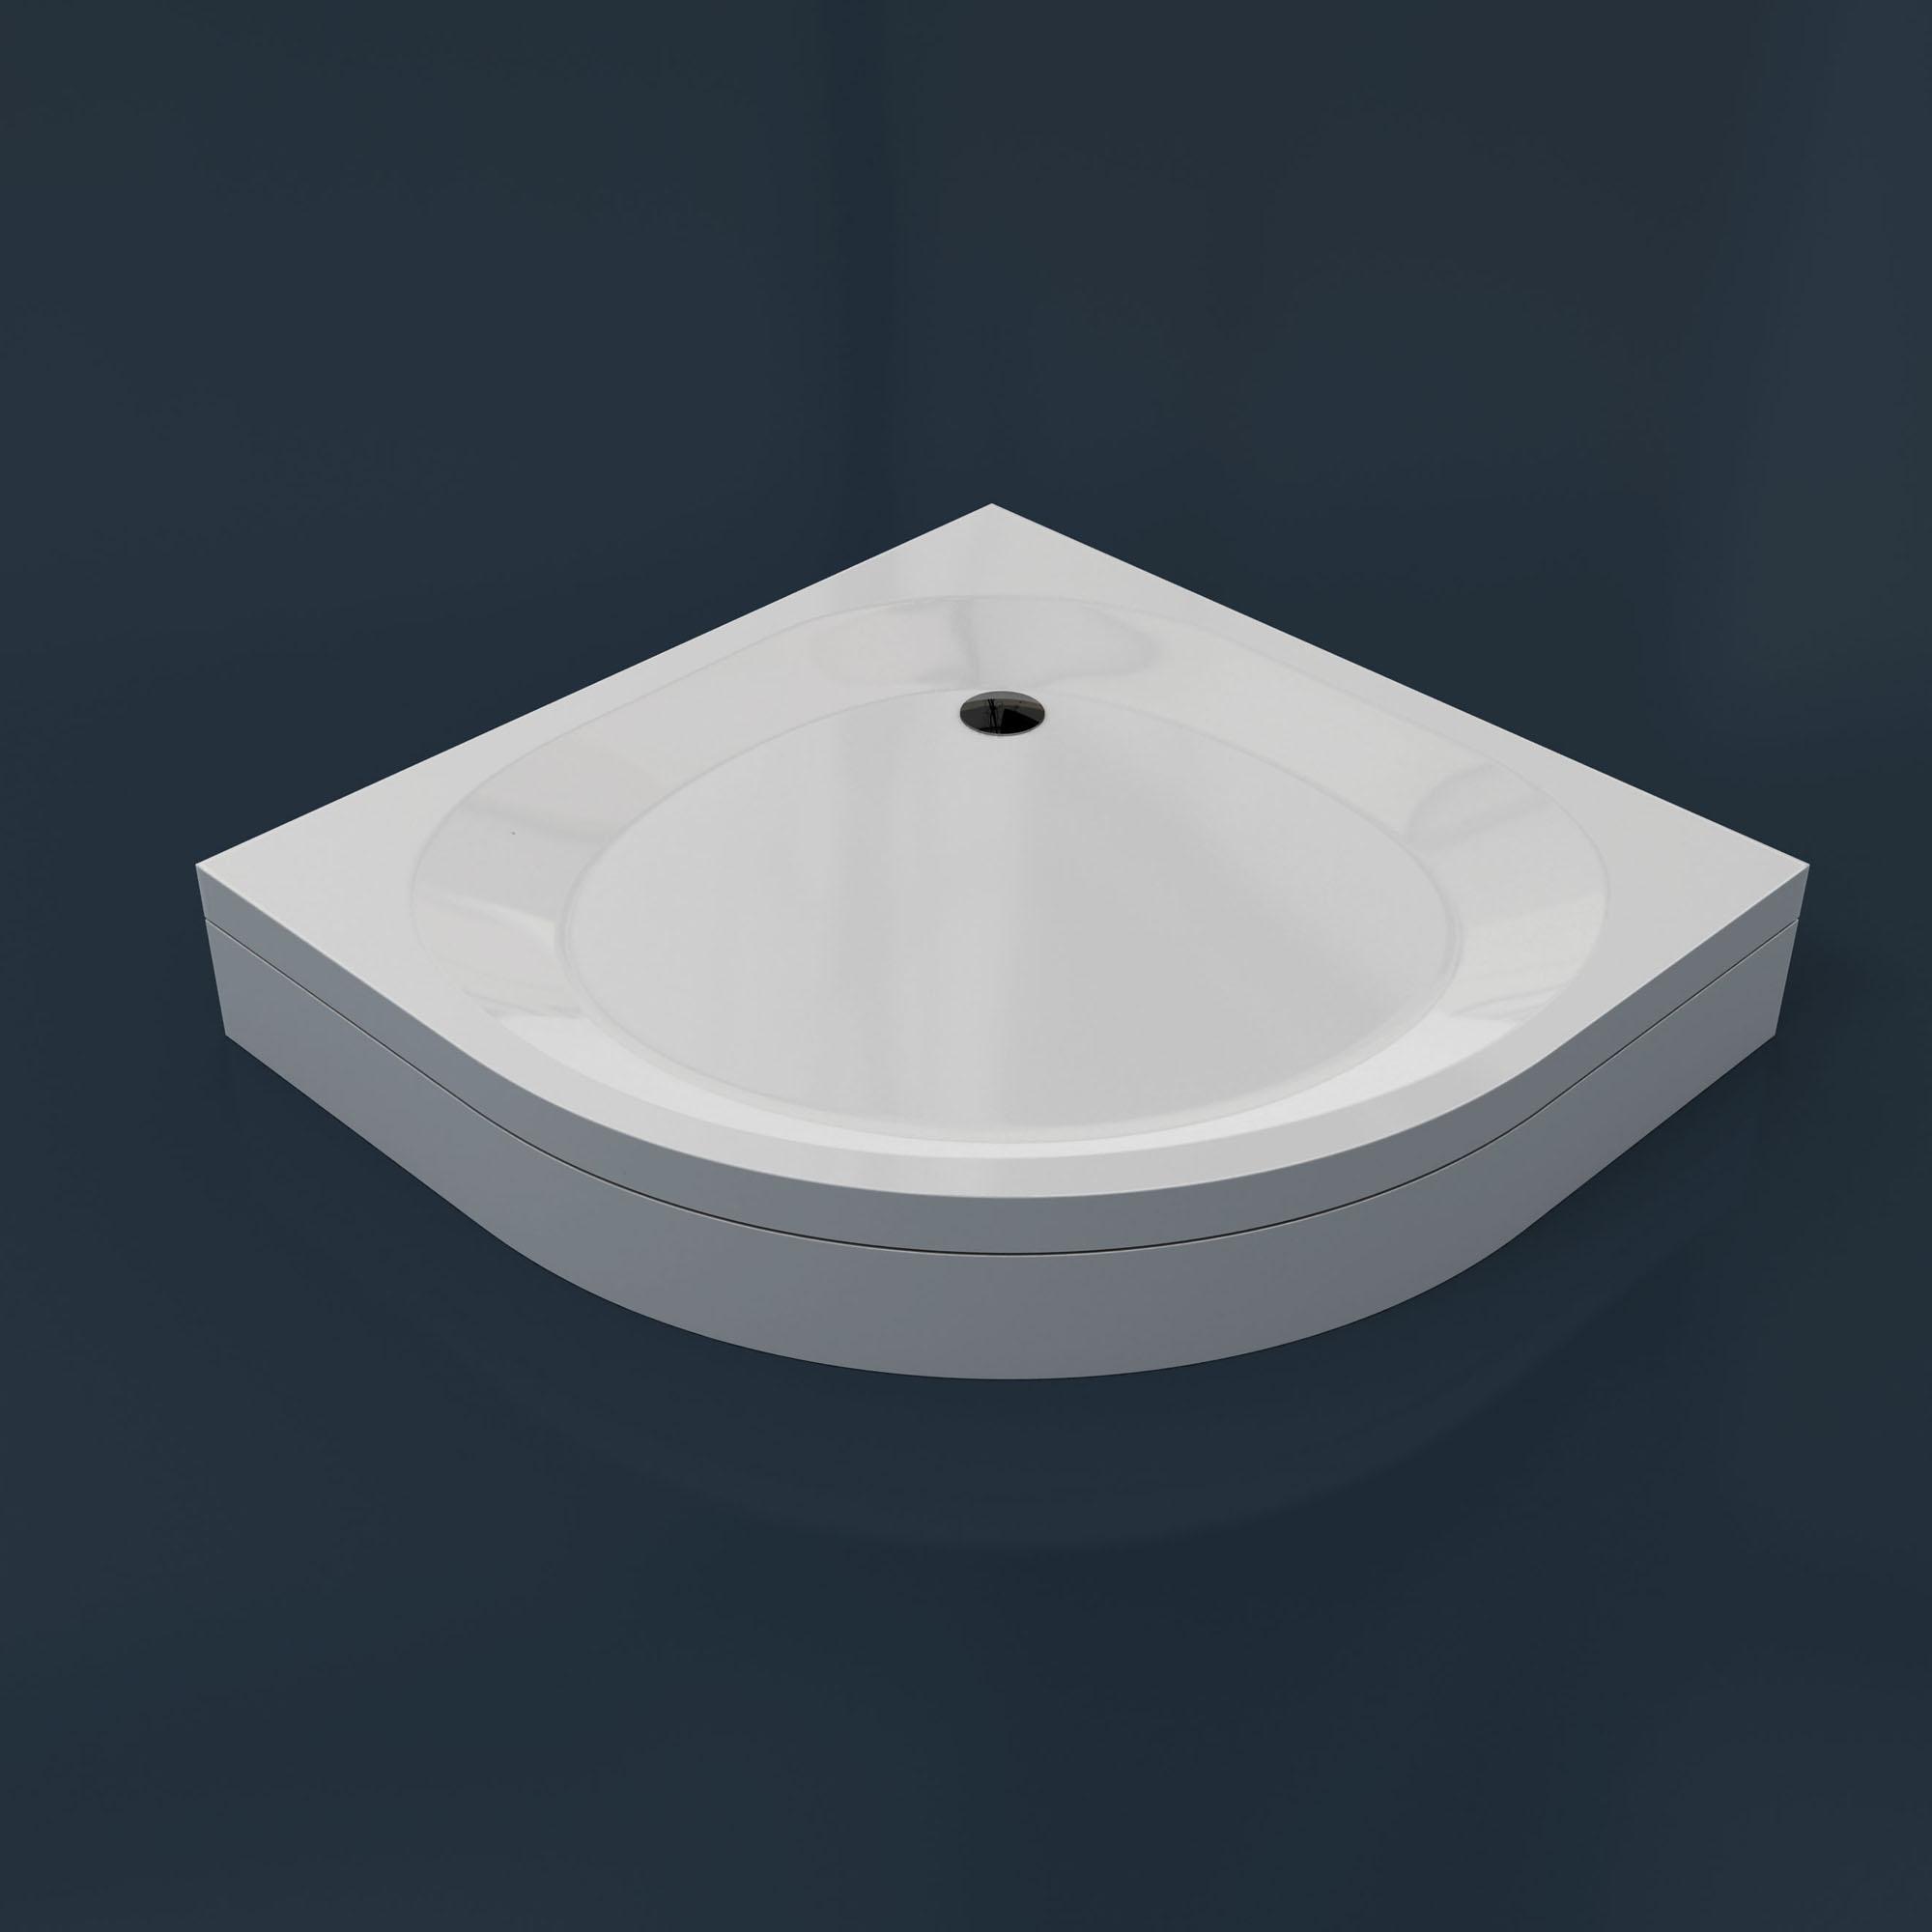 Душевой поддон Esse RS 90 (R550) душевой трап pestan square 3 150 мм 13000007